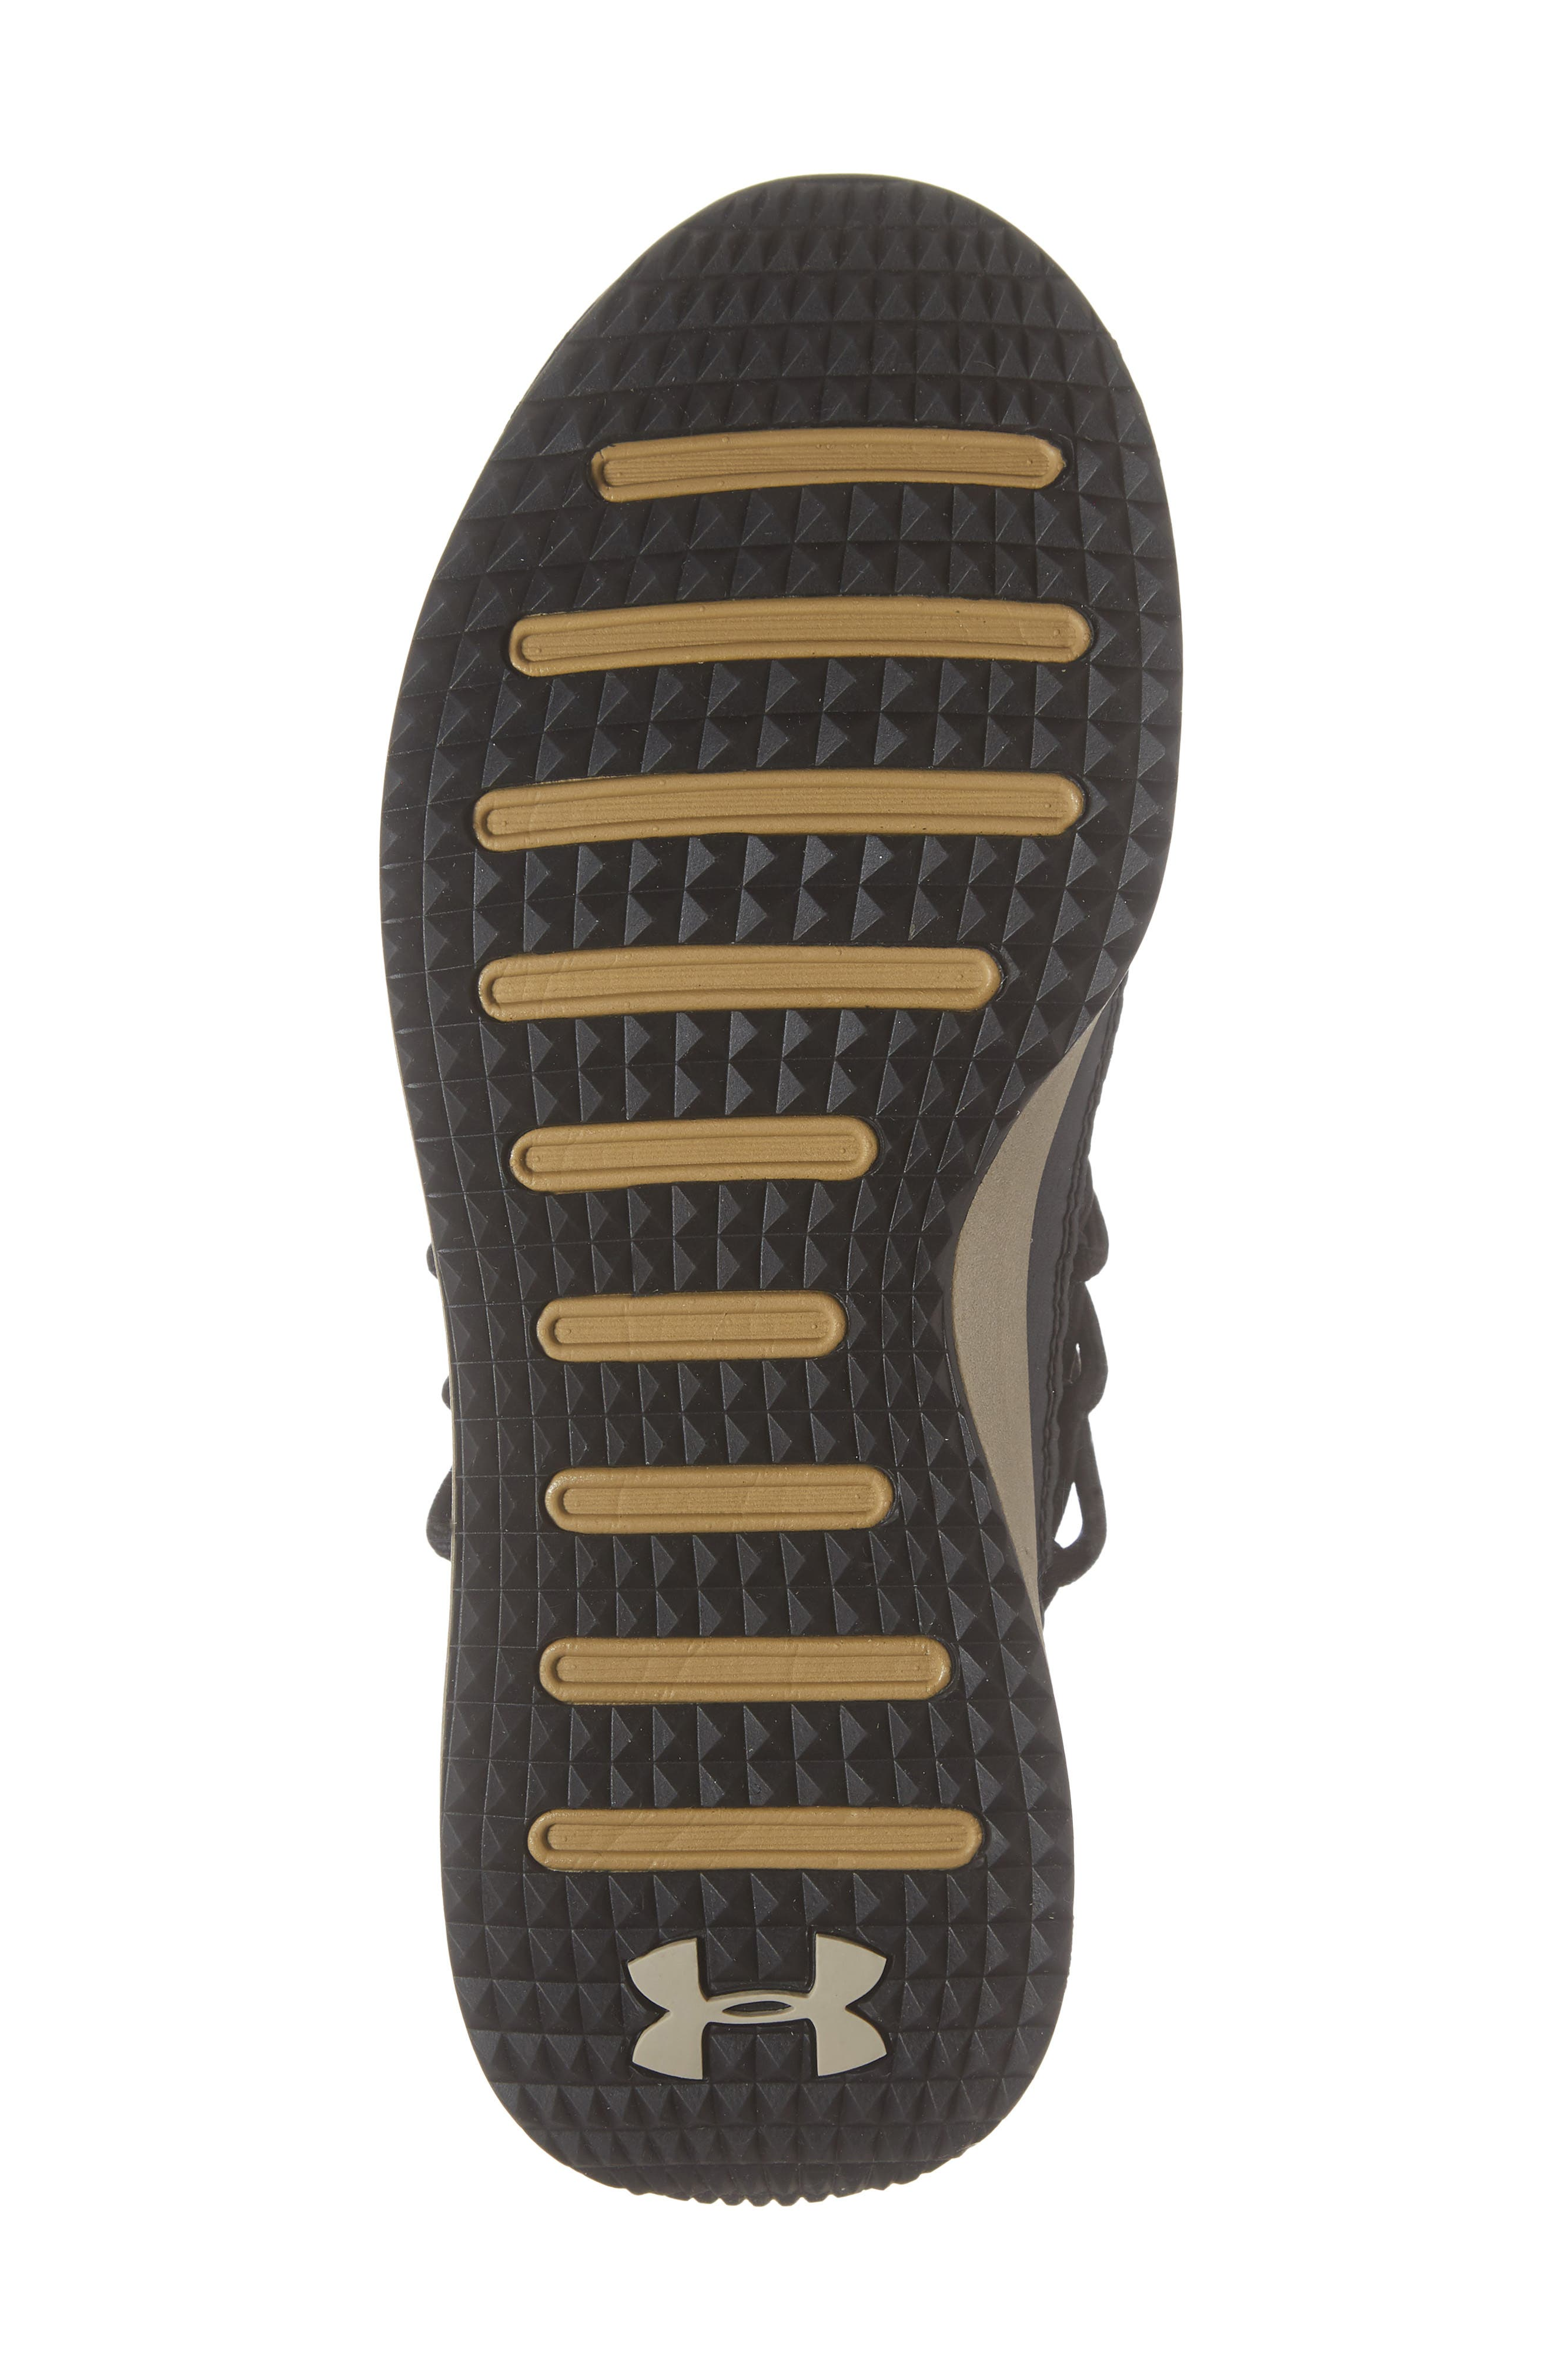 Breathe Lace X NM Sneaker,                             Alternate thumbnail 6, color,                             BLACK/ METALLIC FADED GOLD